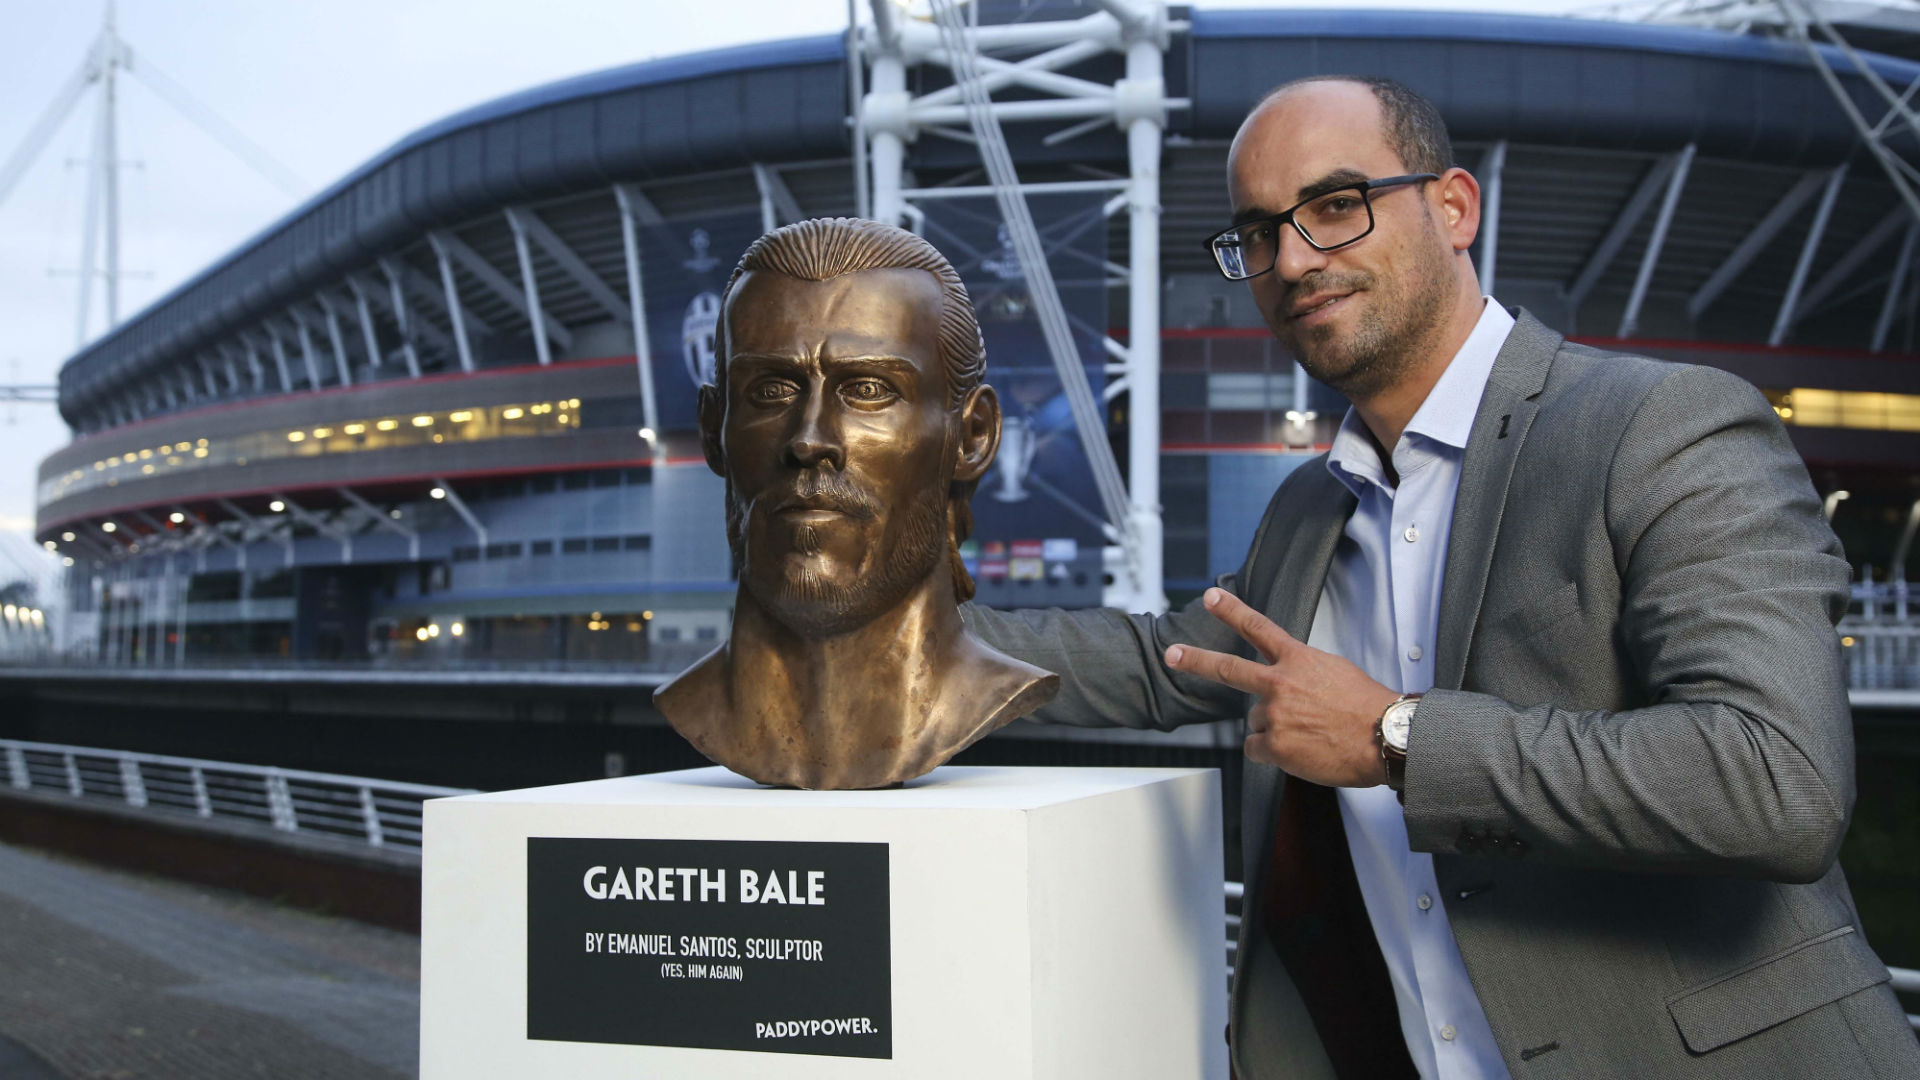 Gareth Bale Statue/Bale Bust